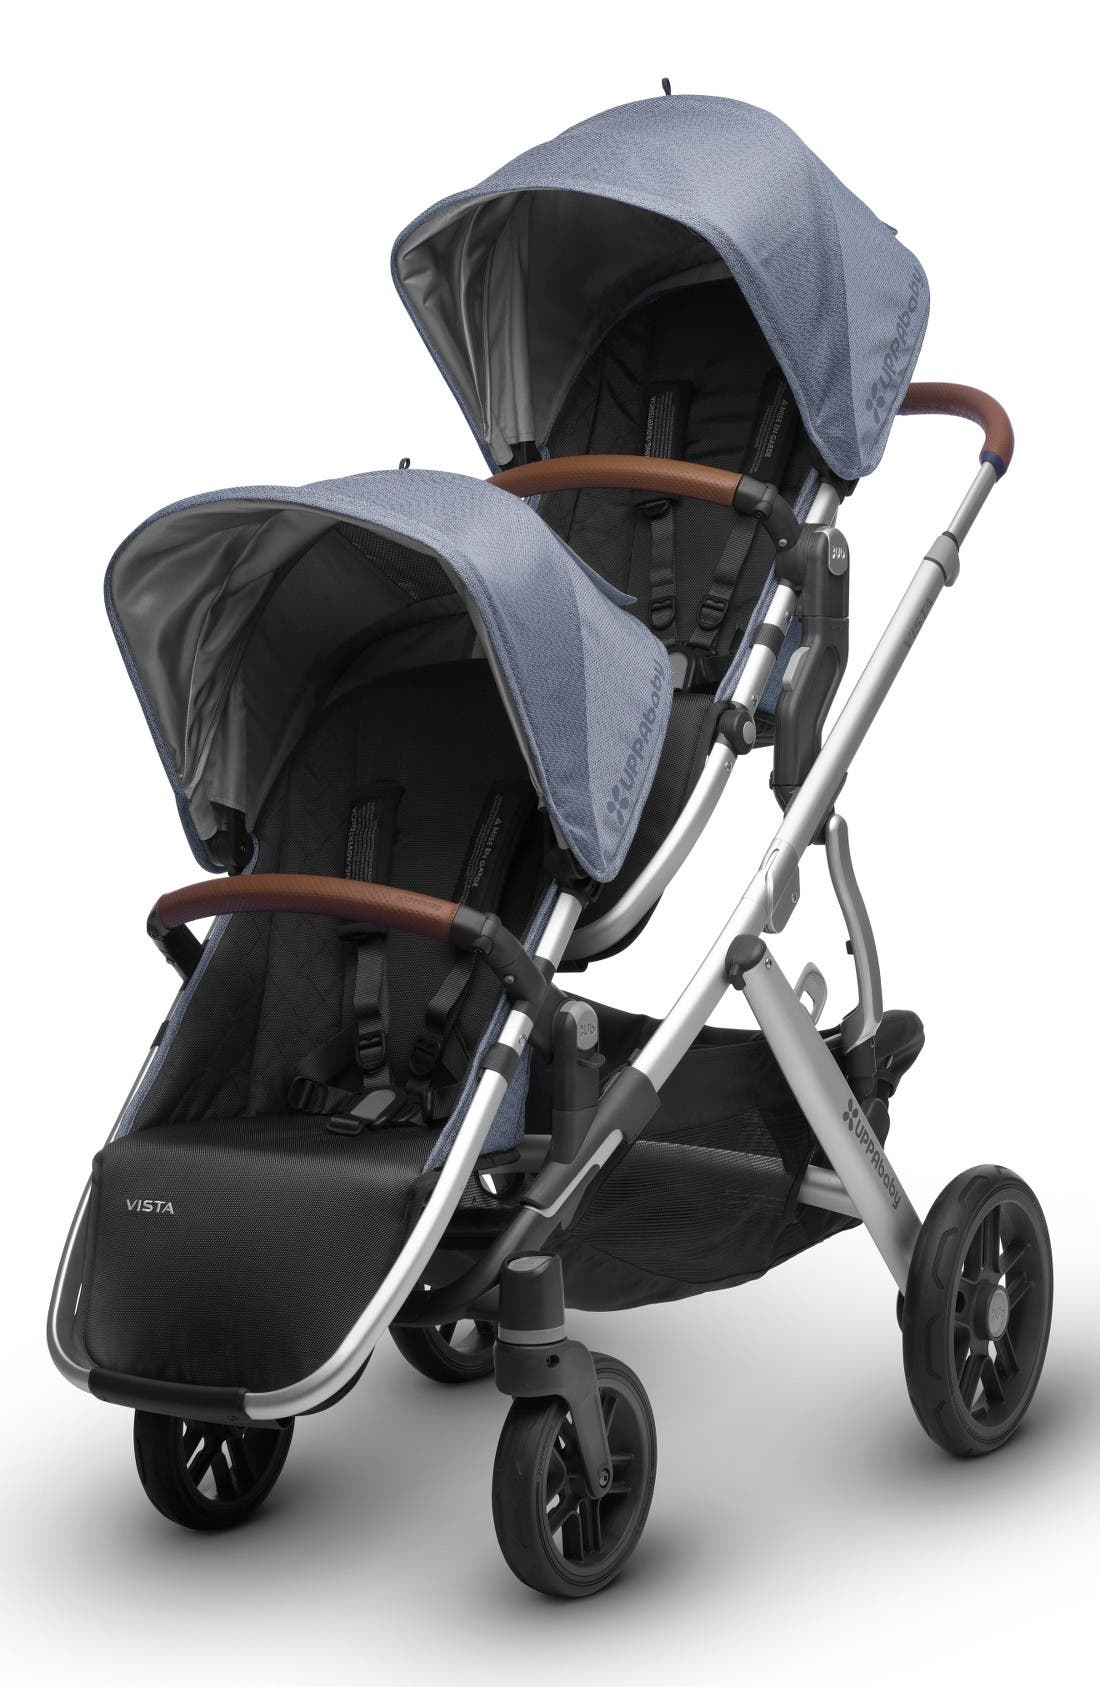 2017 VISTA Henry Aluminum Frame Convertible Stroller with Bassinet & Toddler Seat,                             Alternate thumbnail 8, color,                             Blue Marl